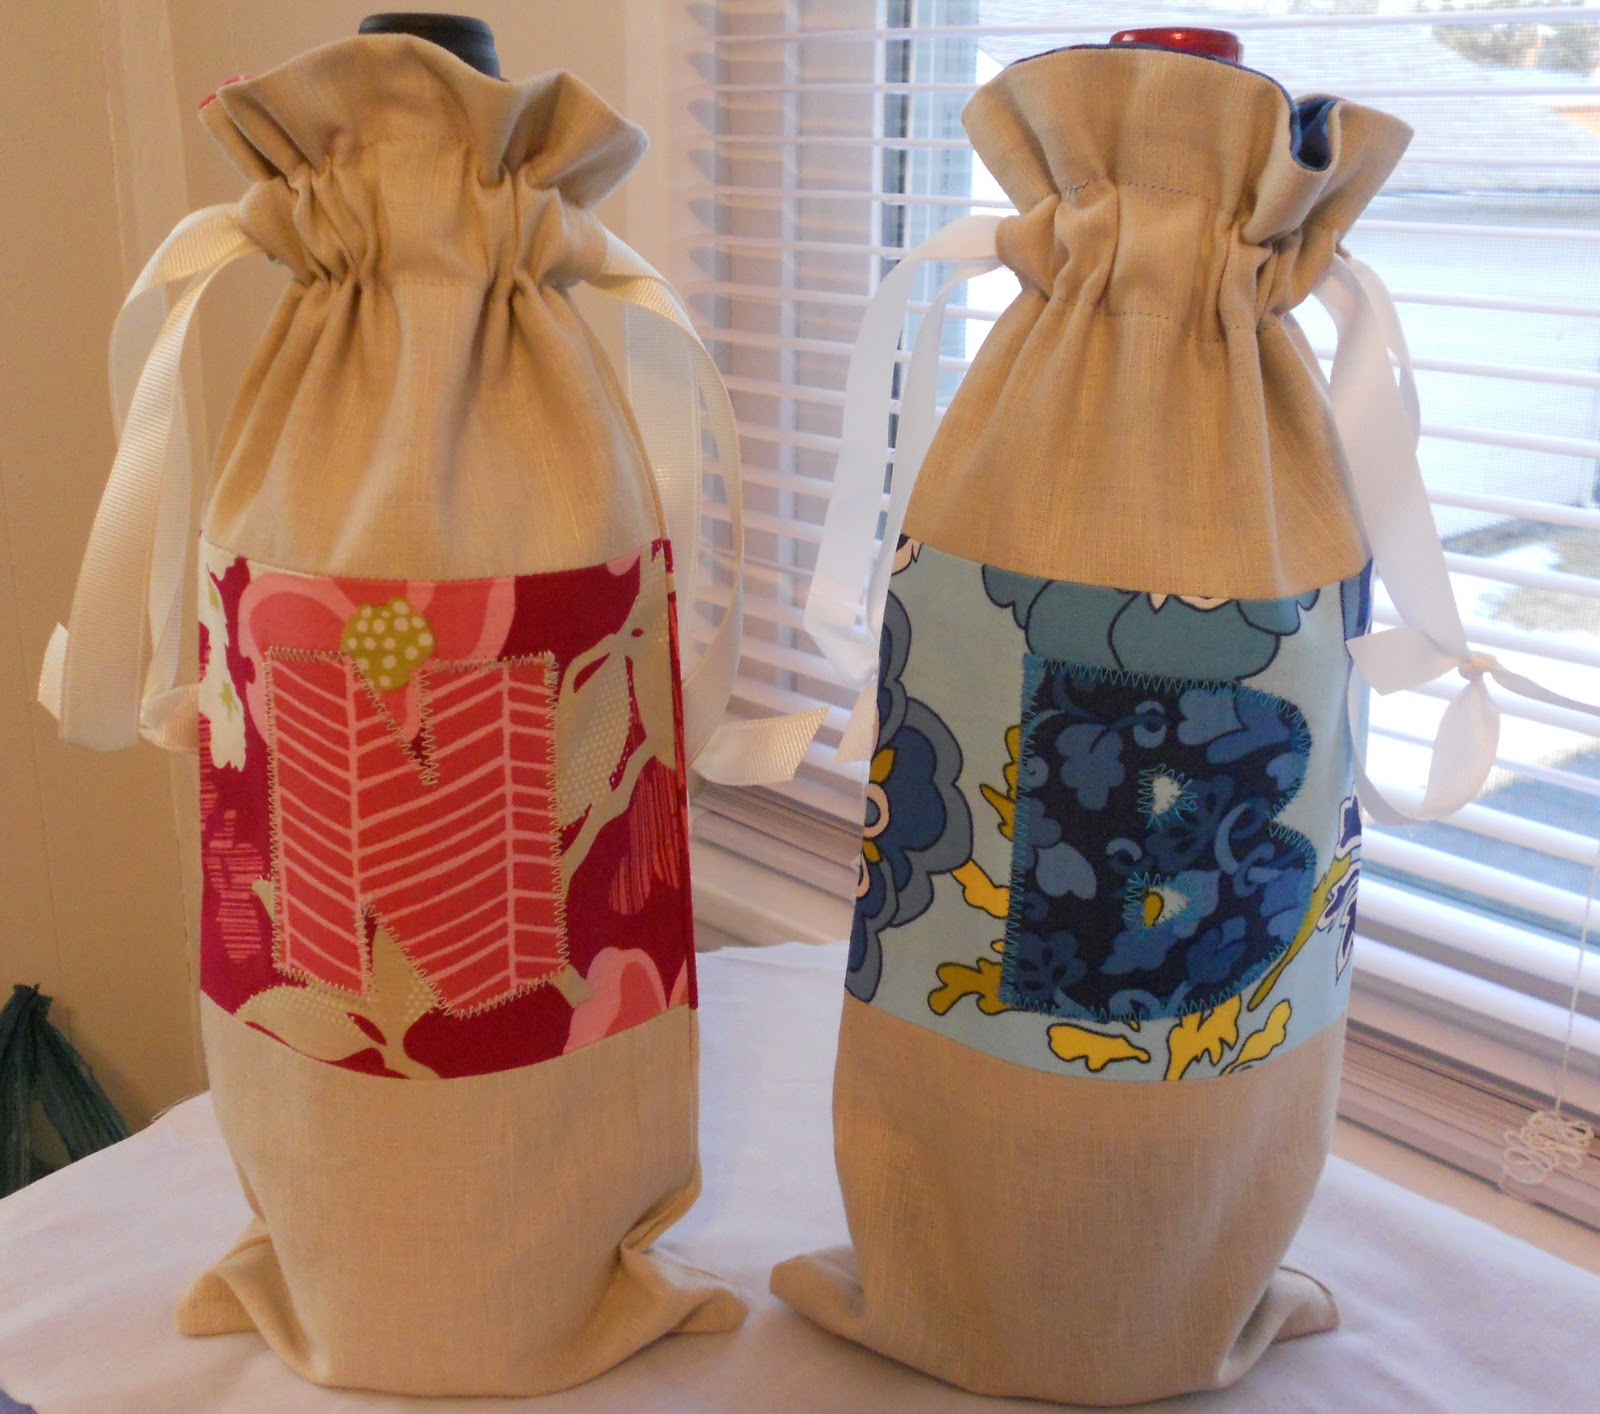 Lined Drawstring Wine Bag Tutorial